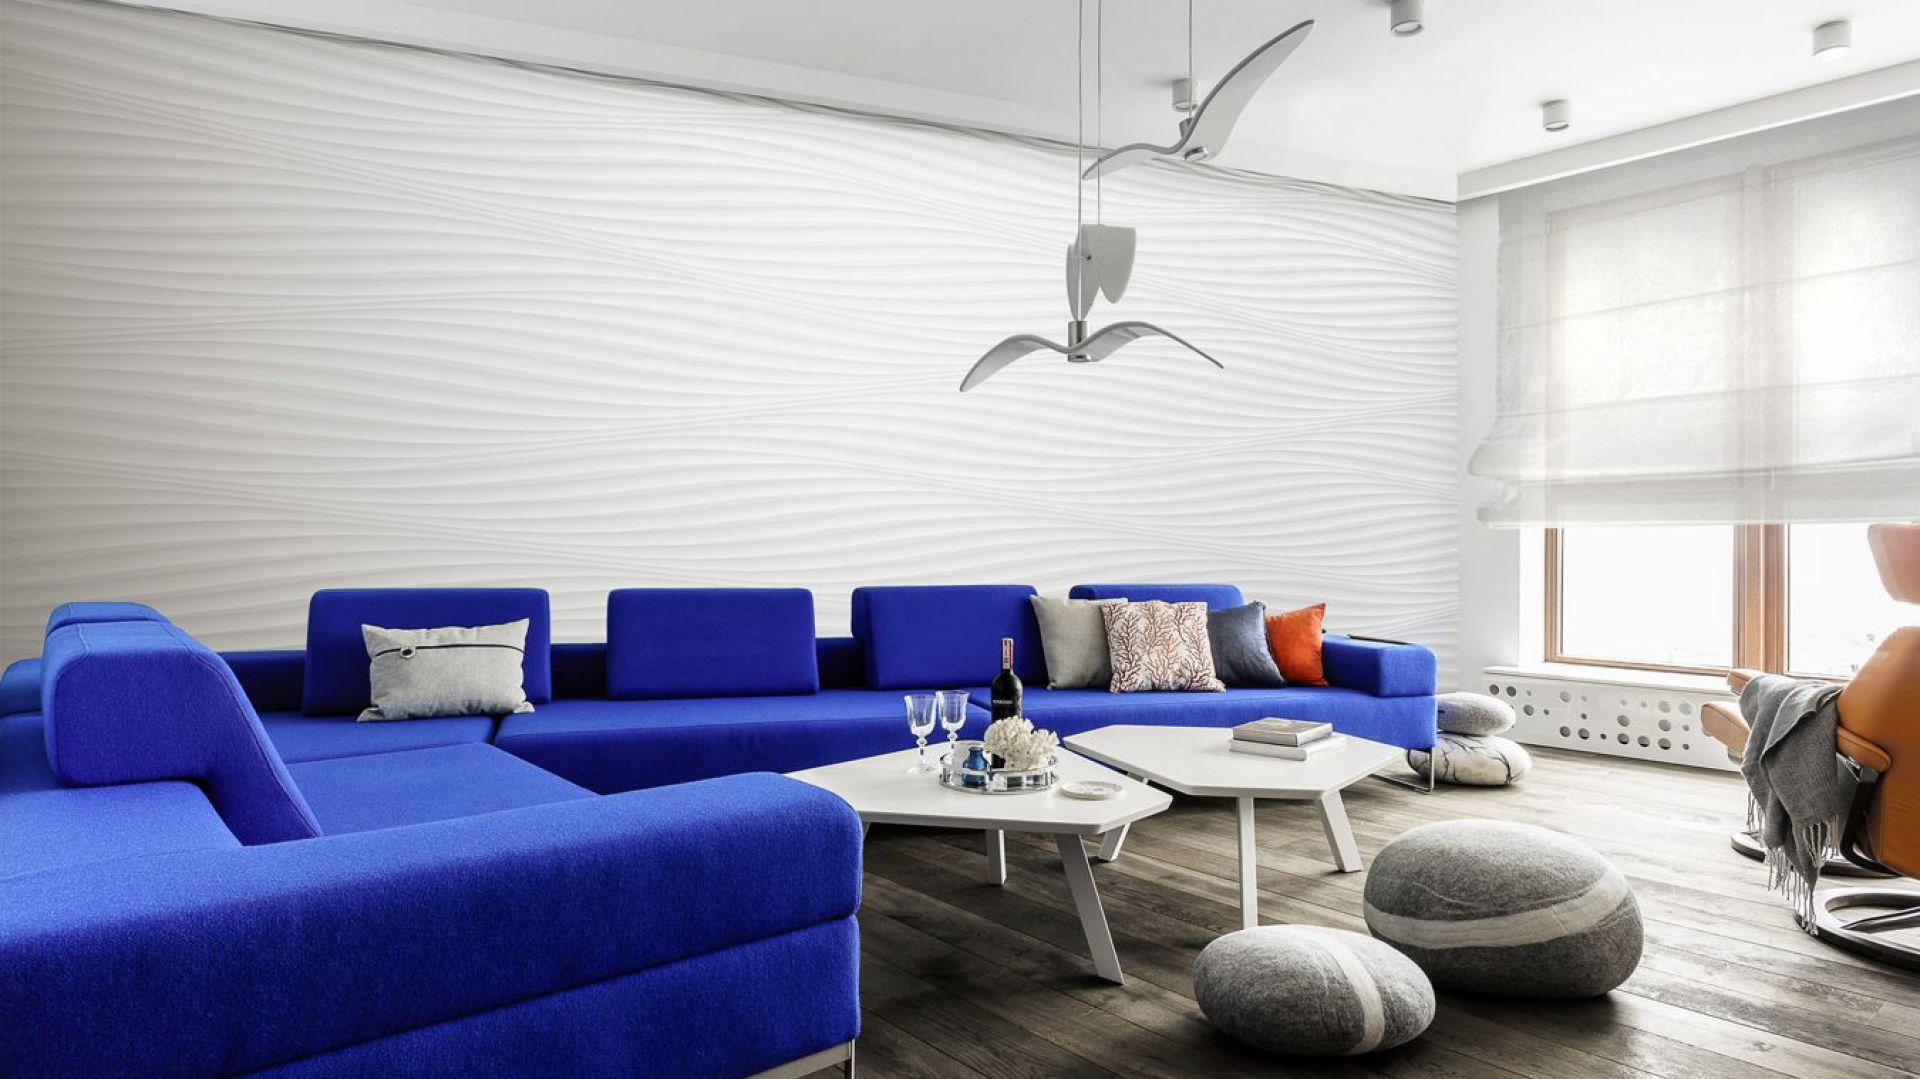 Apartament w Sea Towers. Projekt: Paulina Kasprowicz. Fot. Foto&Mohito